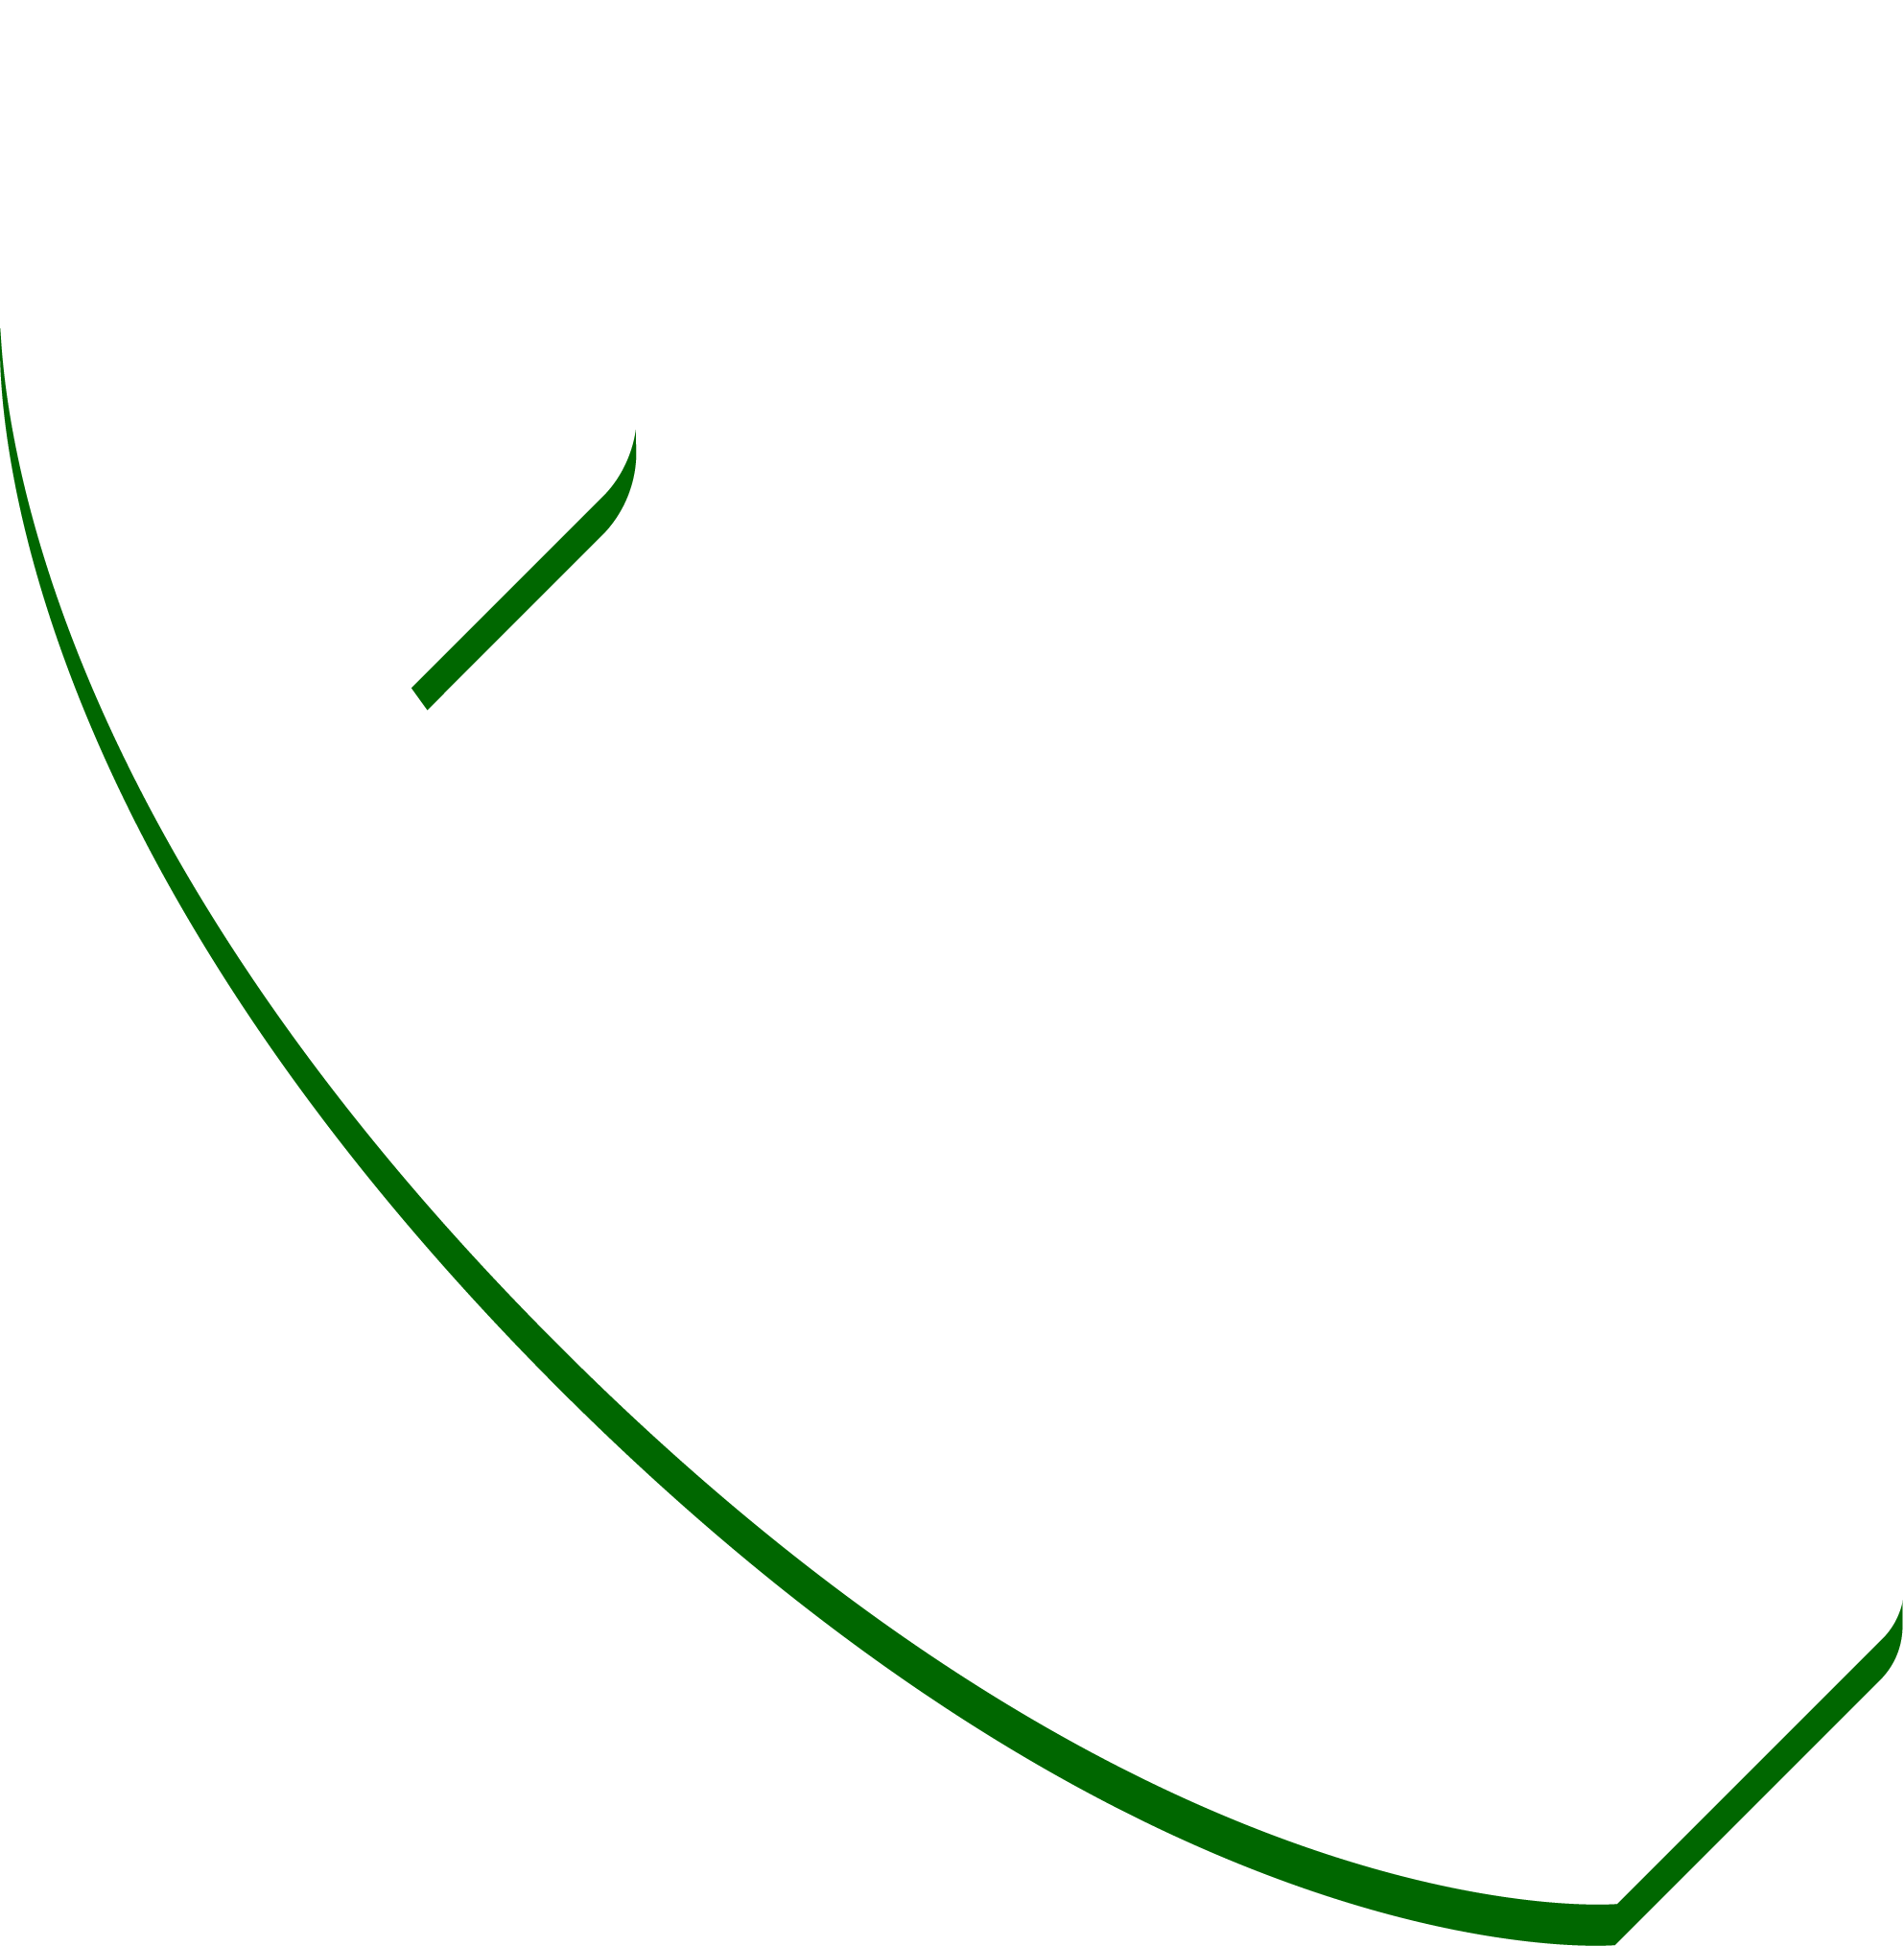 Hotline 0947808727